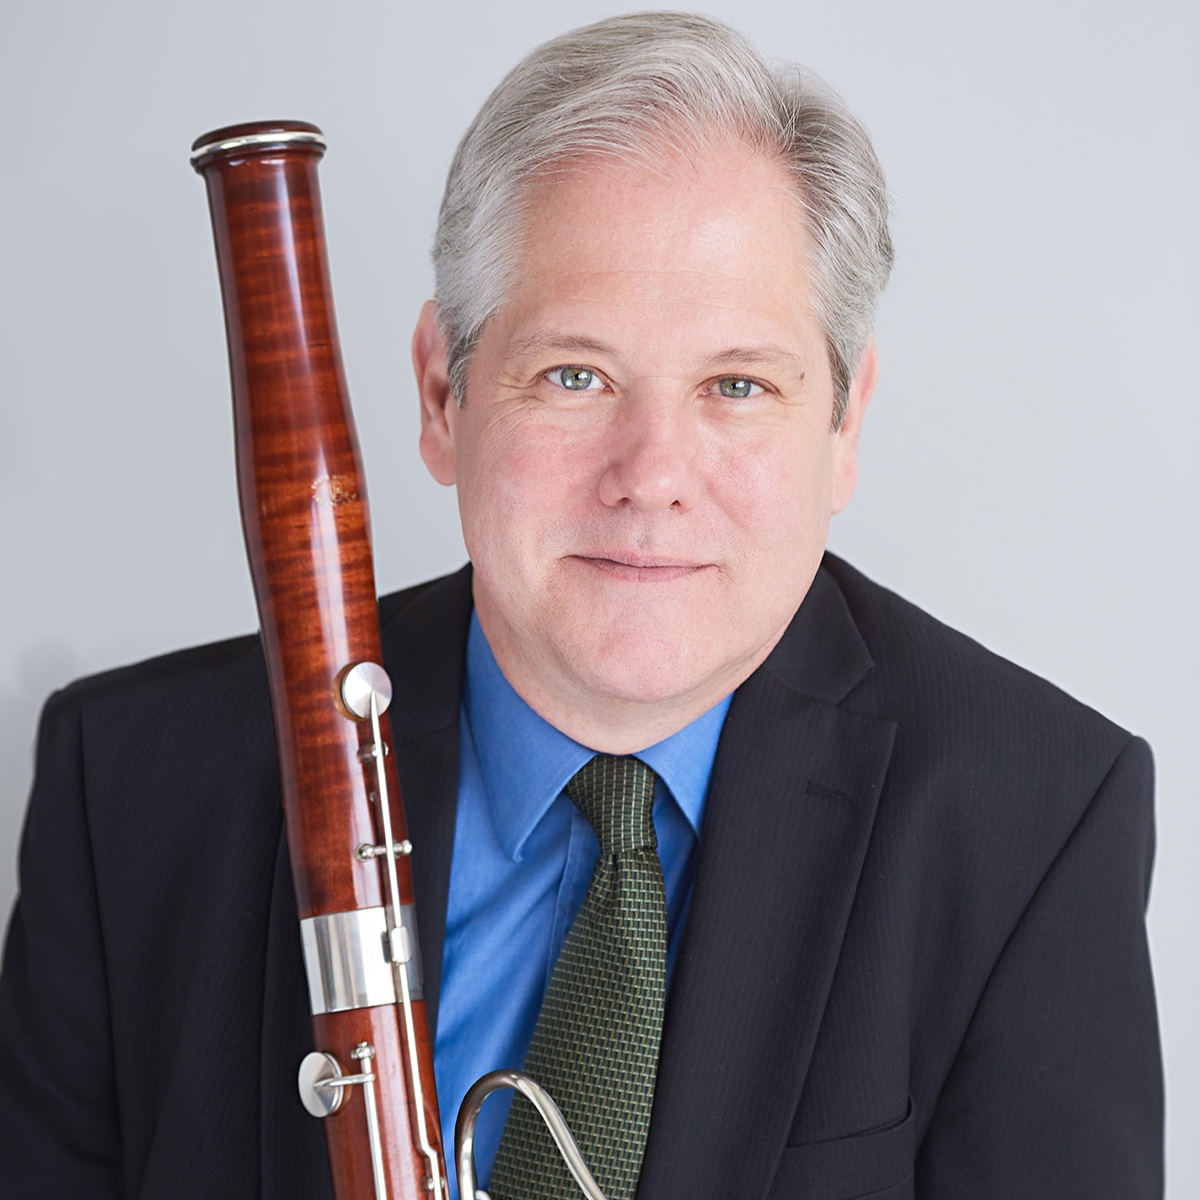 Norbert Nielubowski - Bassoon, Co-Artistic DirectorMinnesota Orchestra